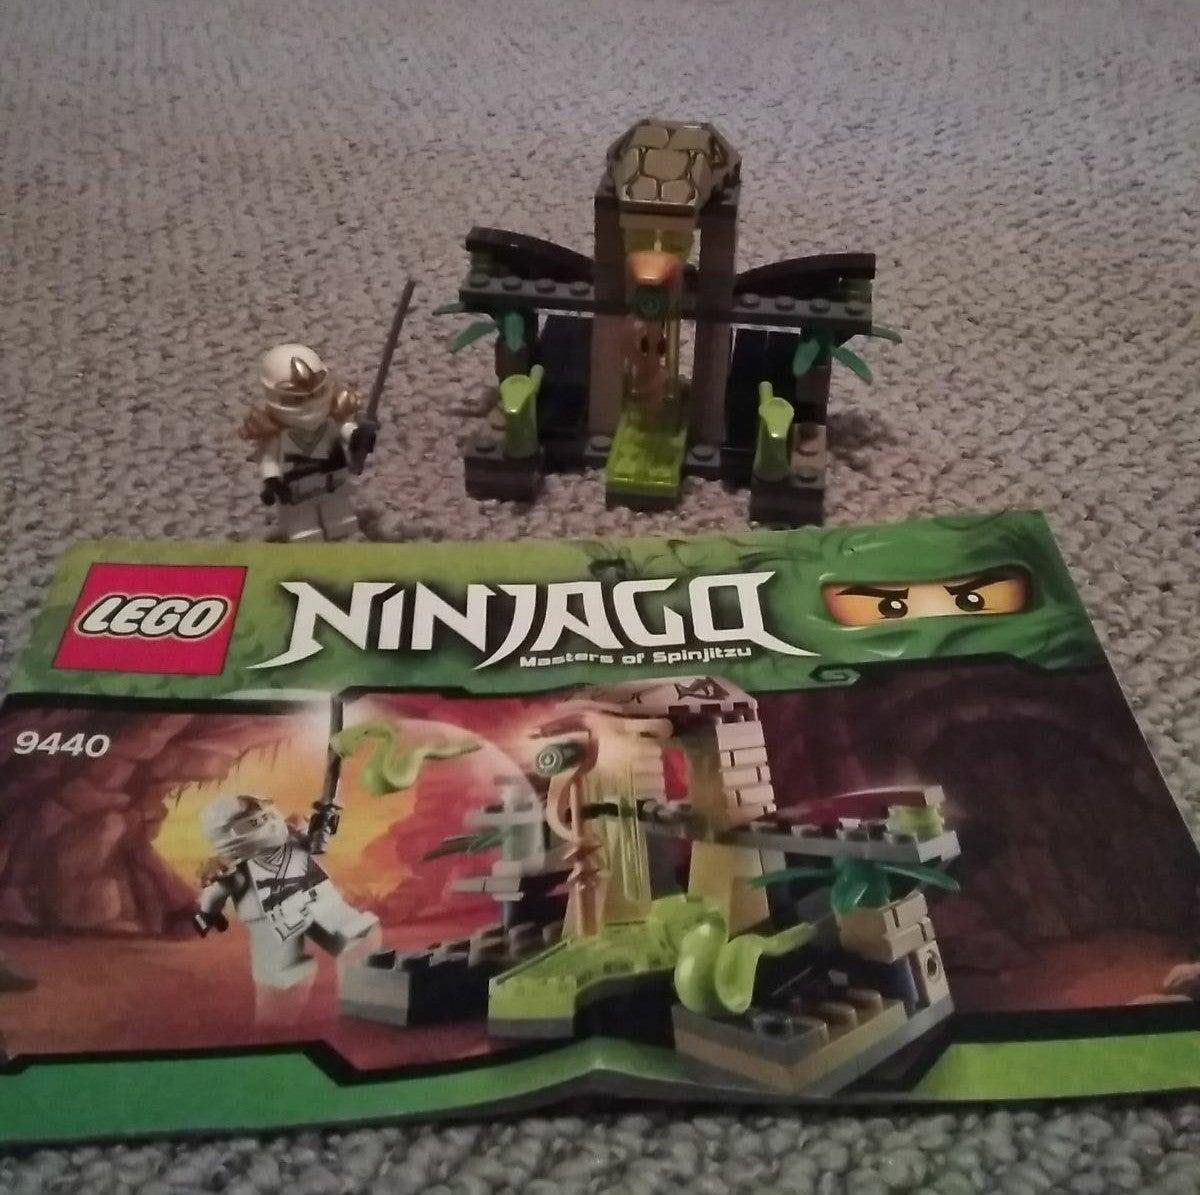 Lego Ninjago Masters of Spinjitzu Set